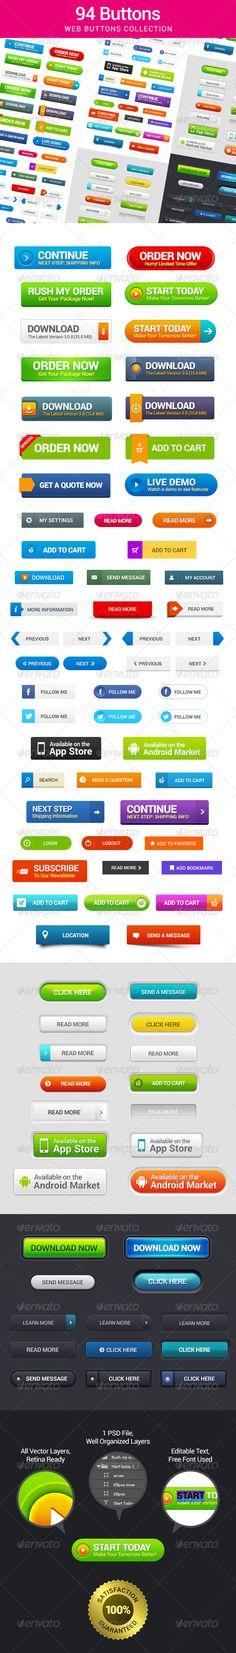 94 Web Buttons